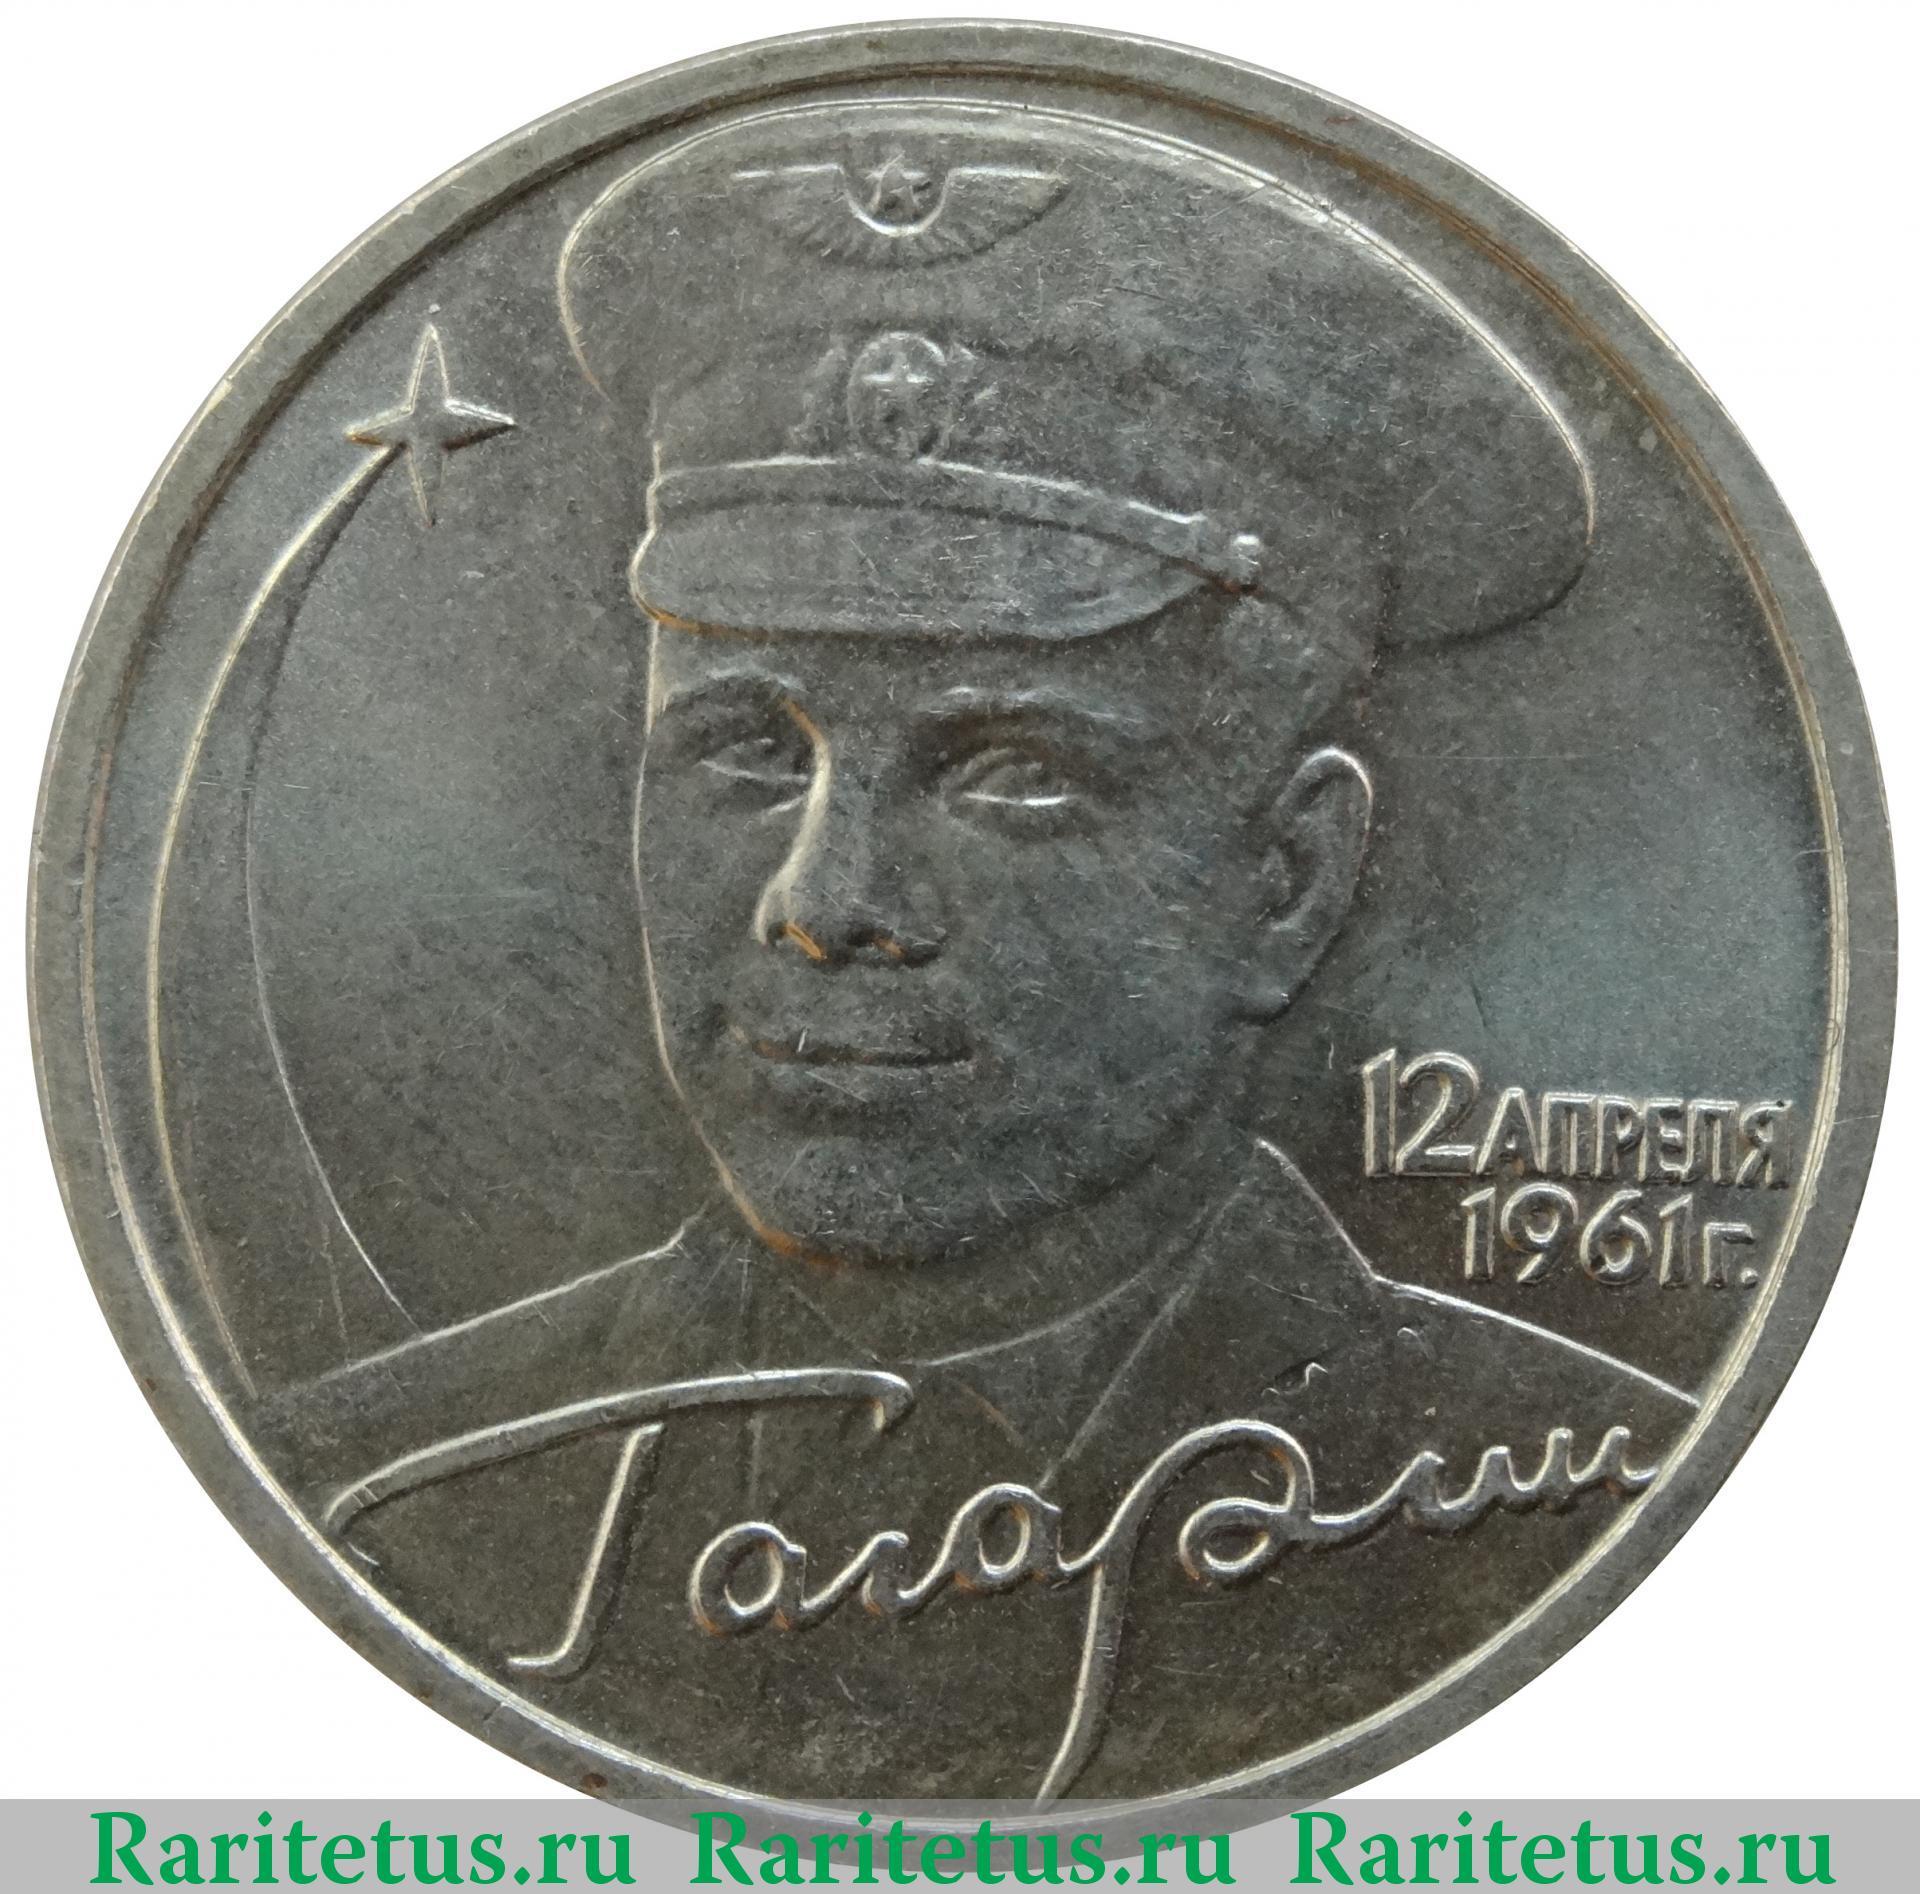 Два рубля гагарин 2001 цена lot 24